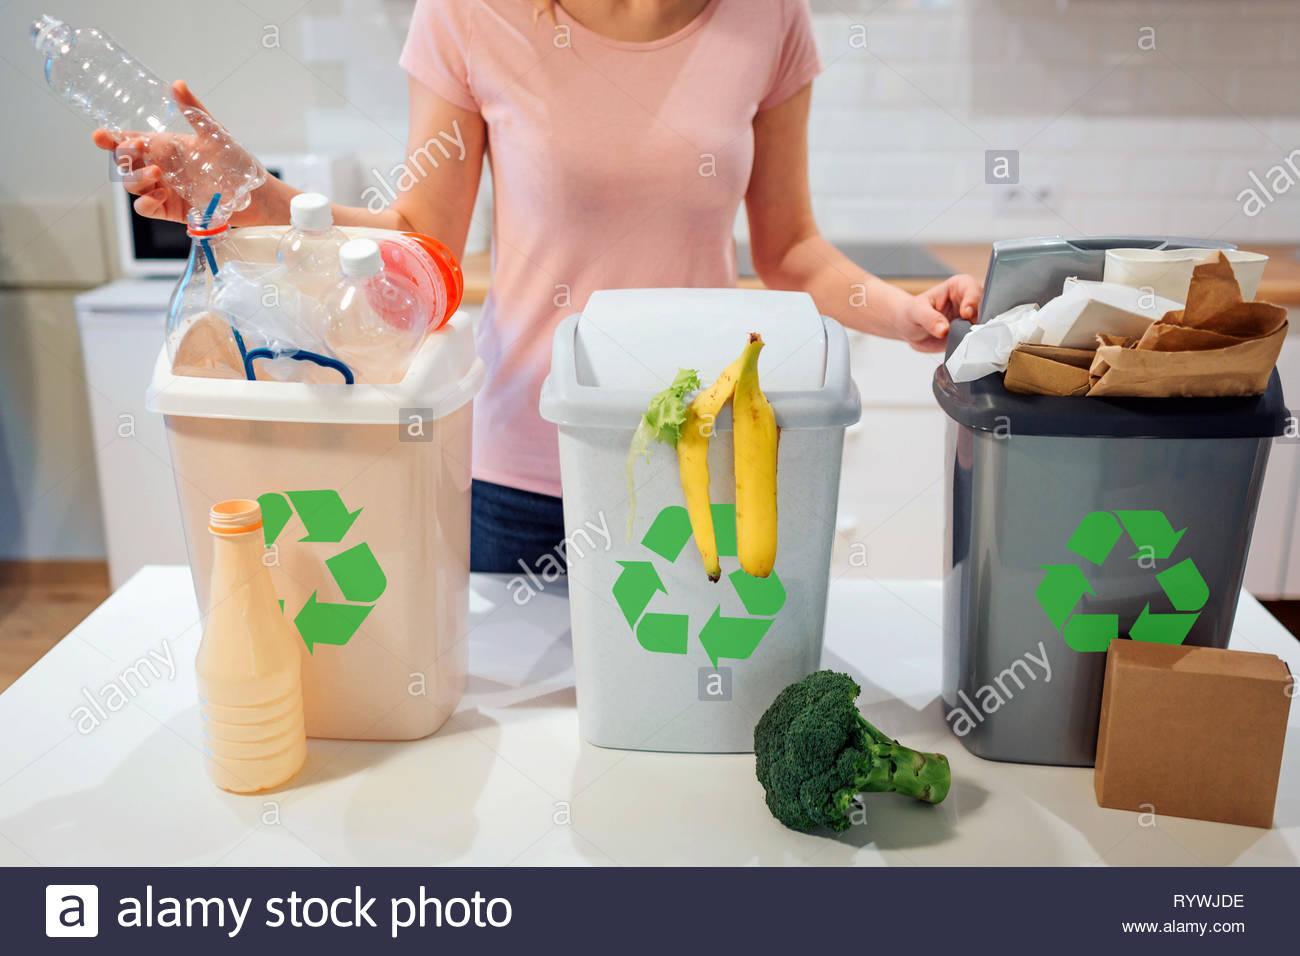 Full Size of Mülleimer Küche Mlltrennung Zu Hause Recycling Frau Plastik Flasche In Den Holzofen Jalousieschrank Stehhilfe Ikea Kosten Bartisch Vinyl Bodenbelag Holz Wohnzimmer Mülleimer Küche